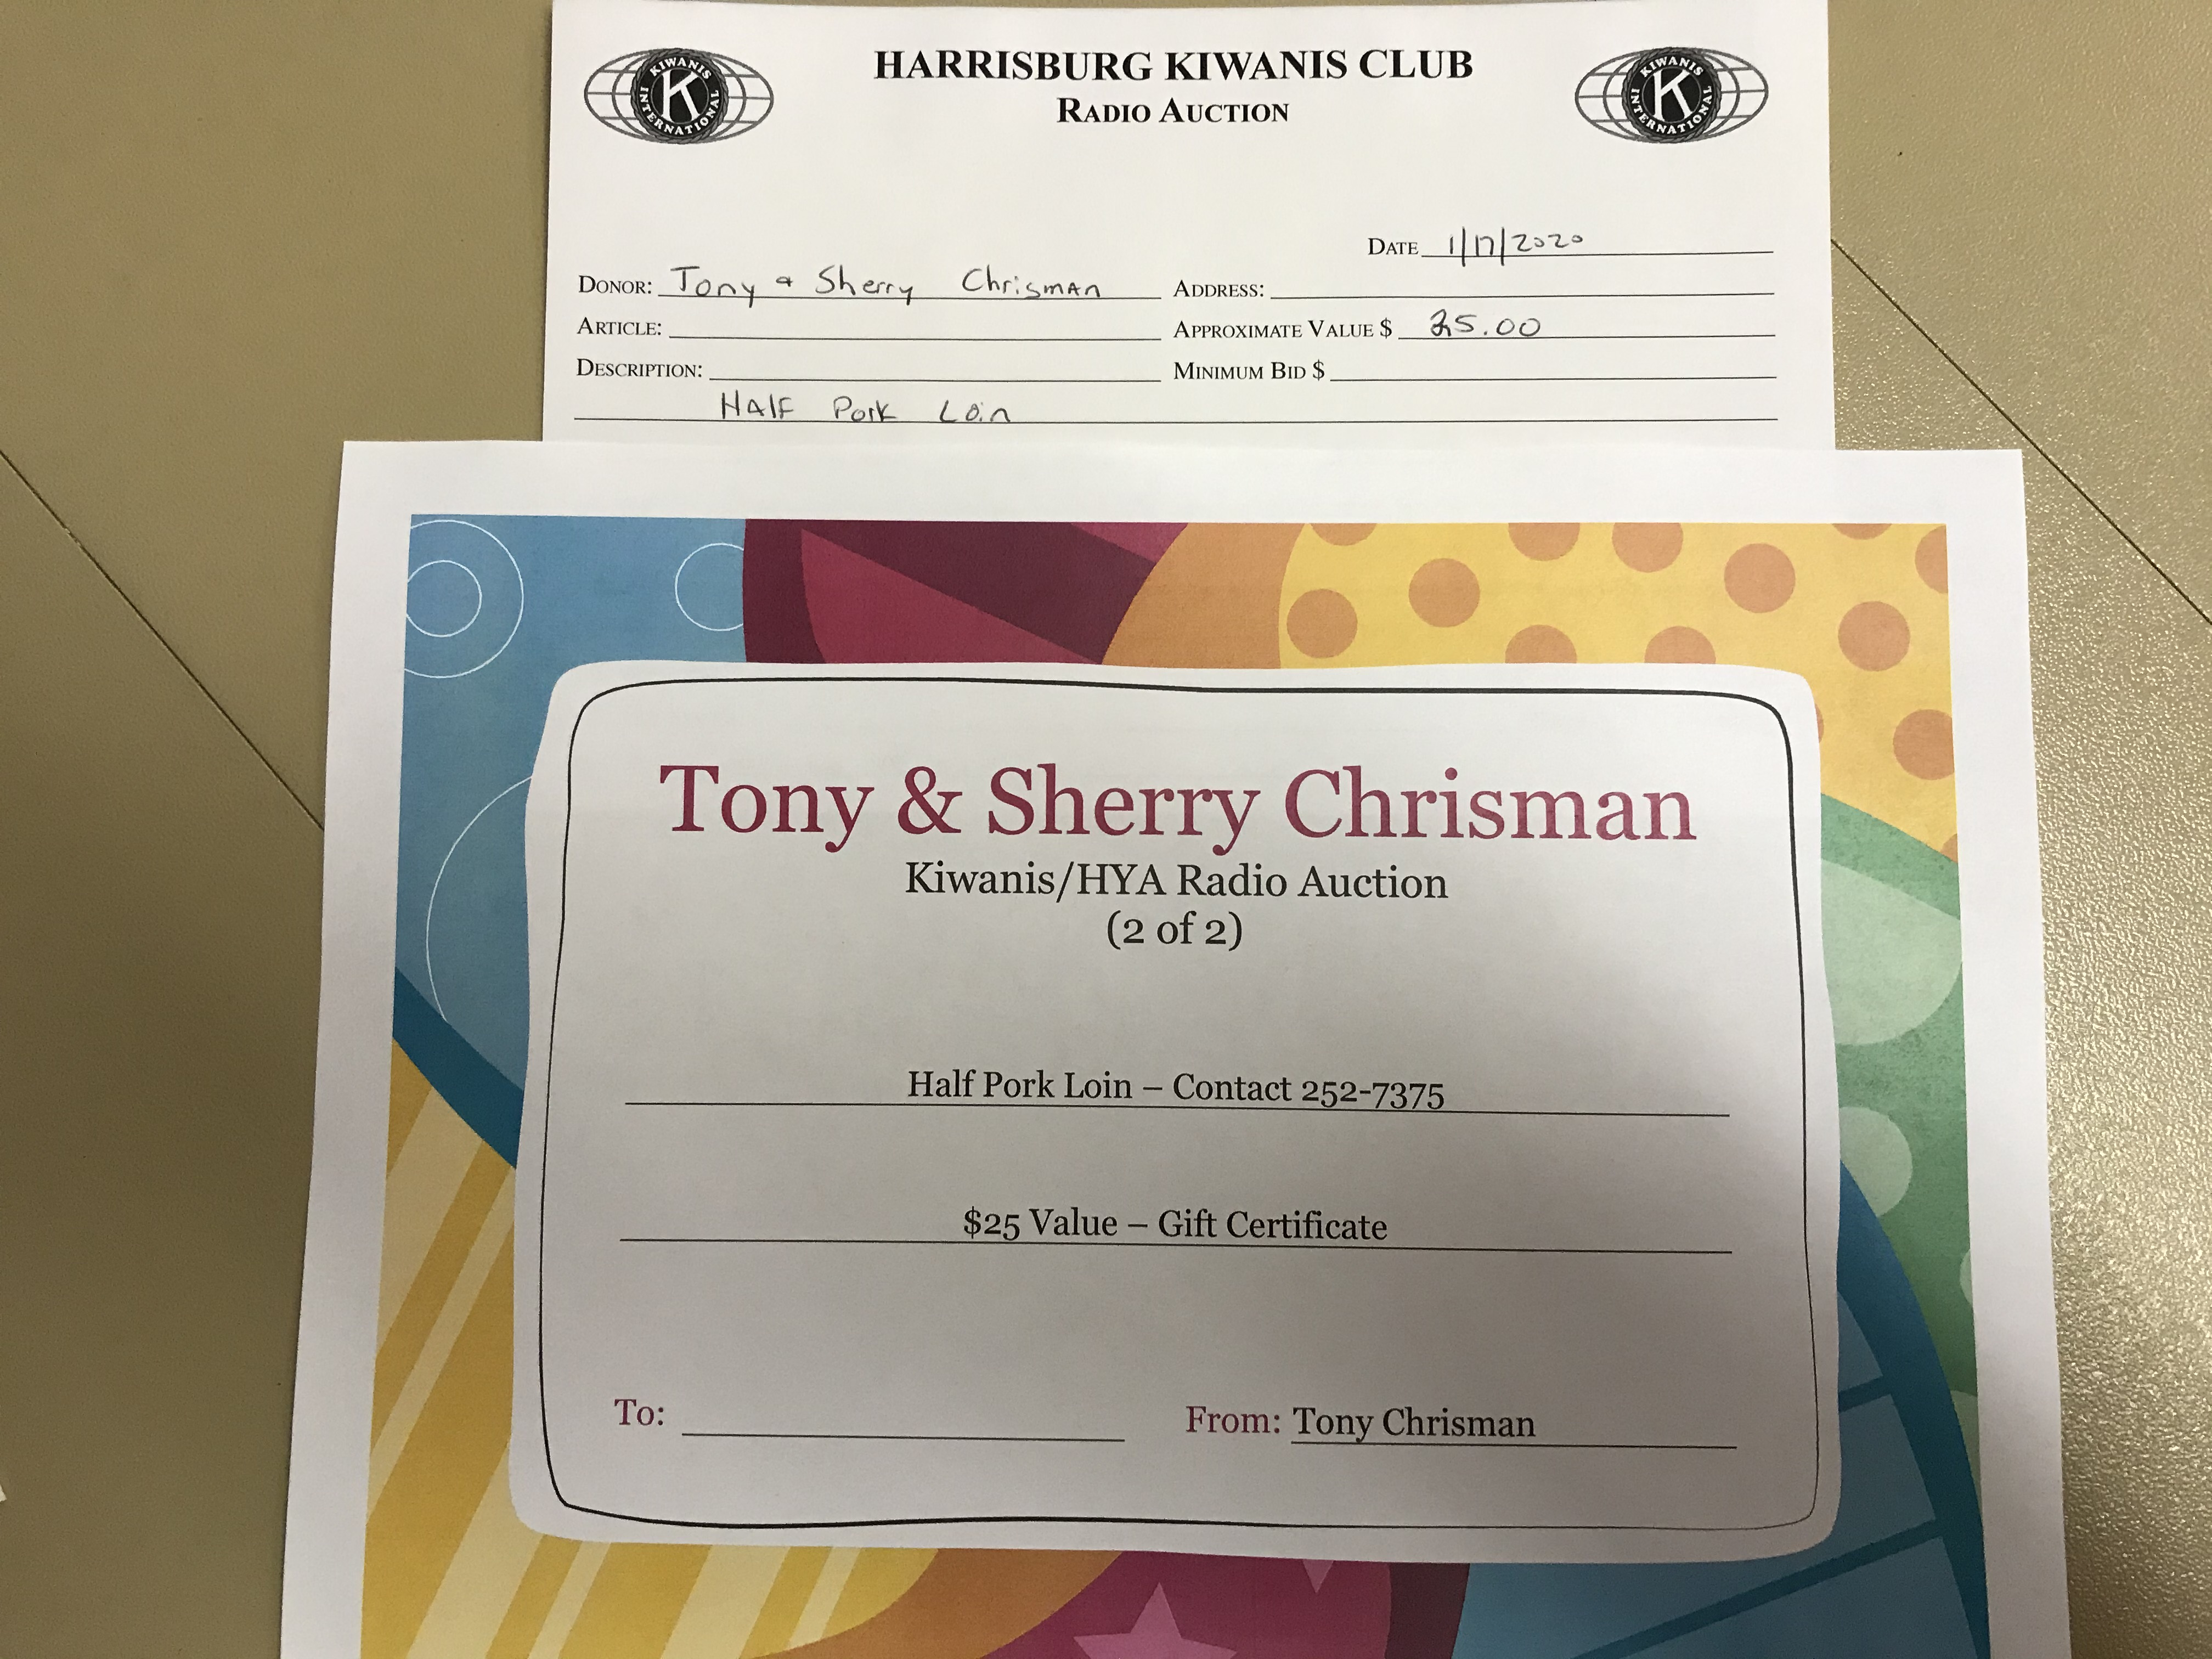 Item 207 - Tony & Sherry Chrisman Half Pork Loin